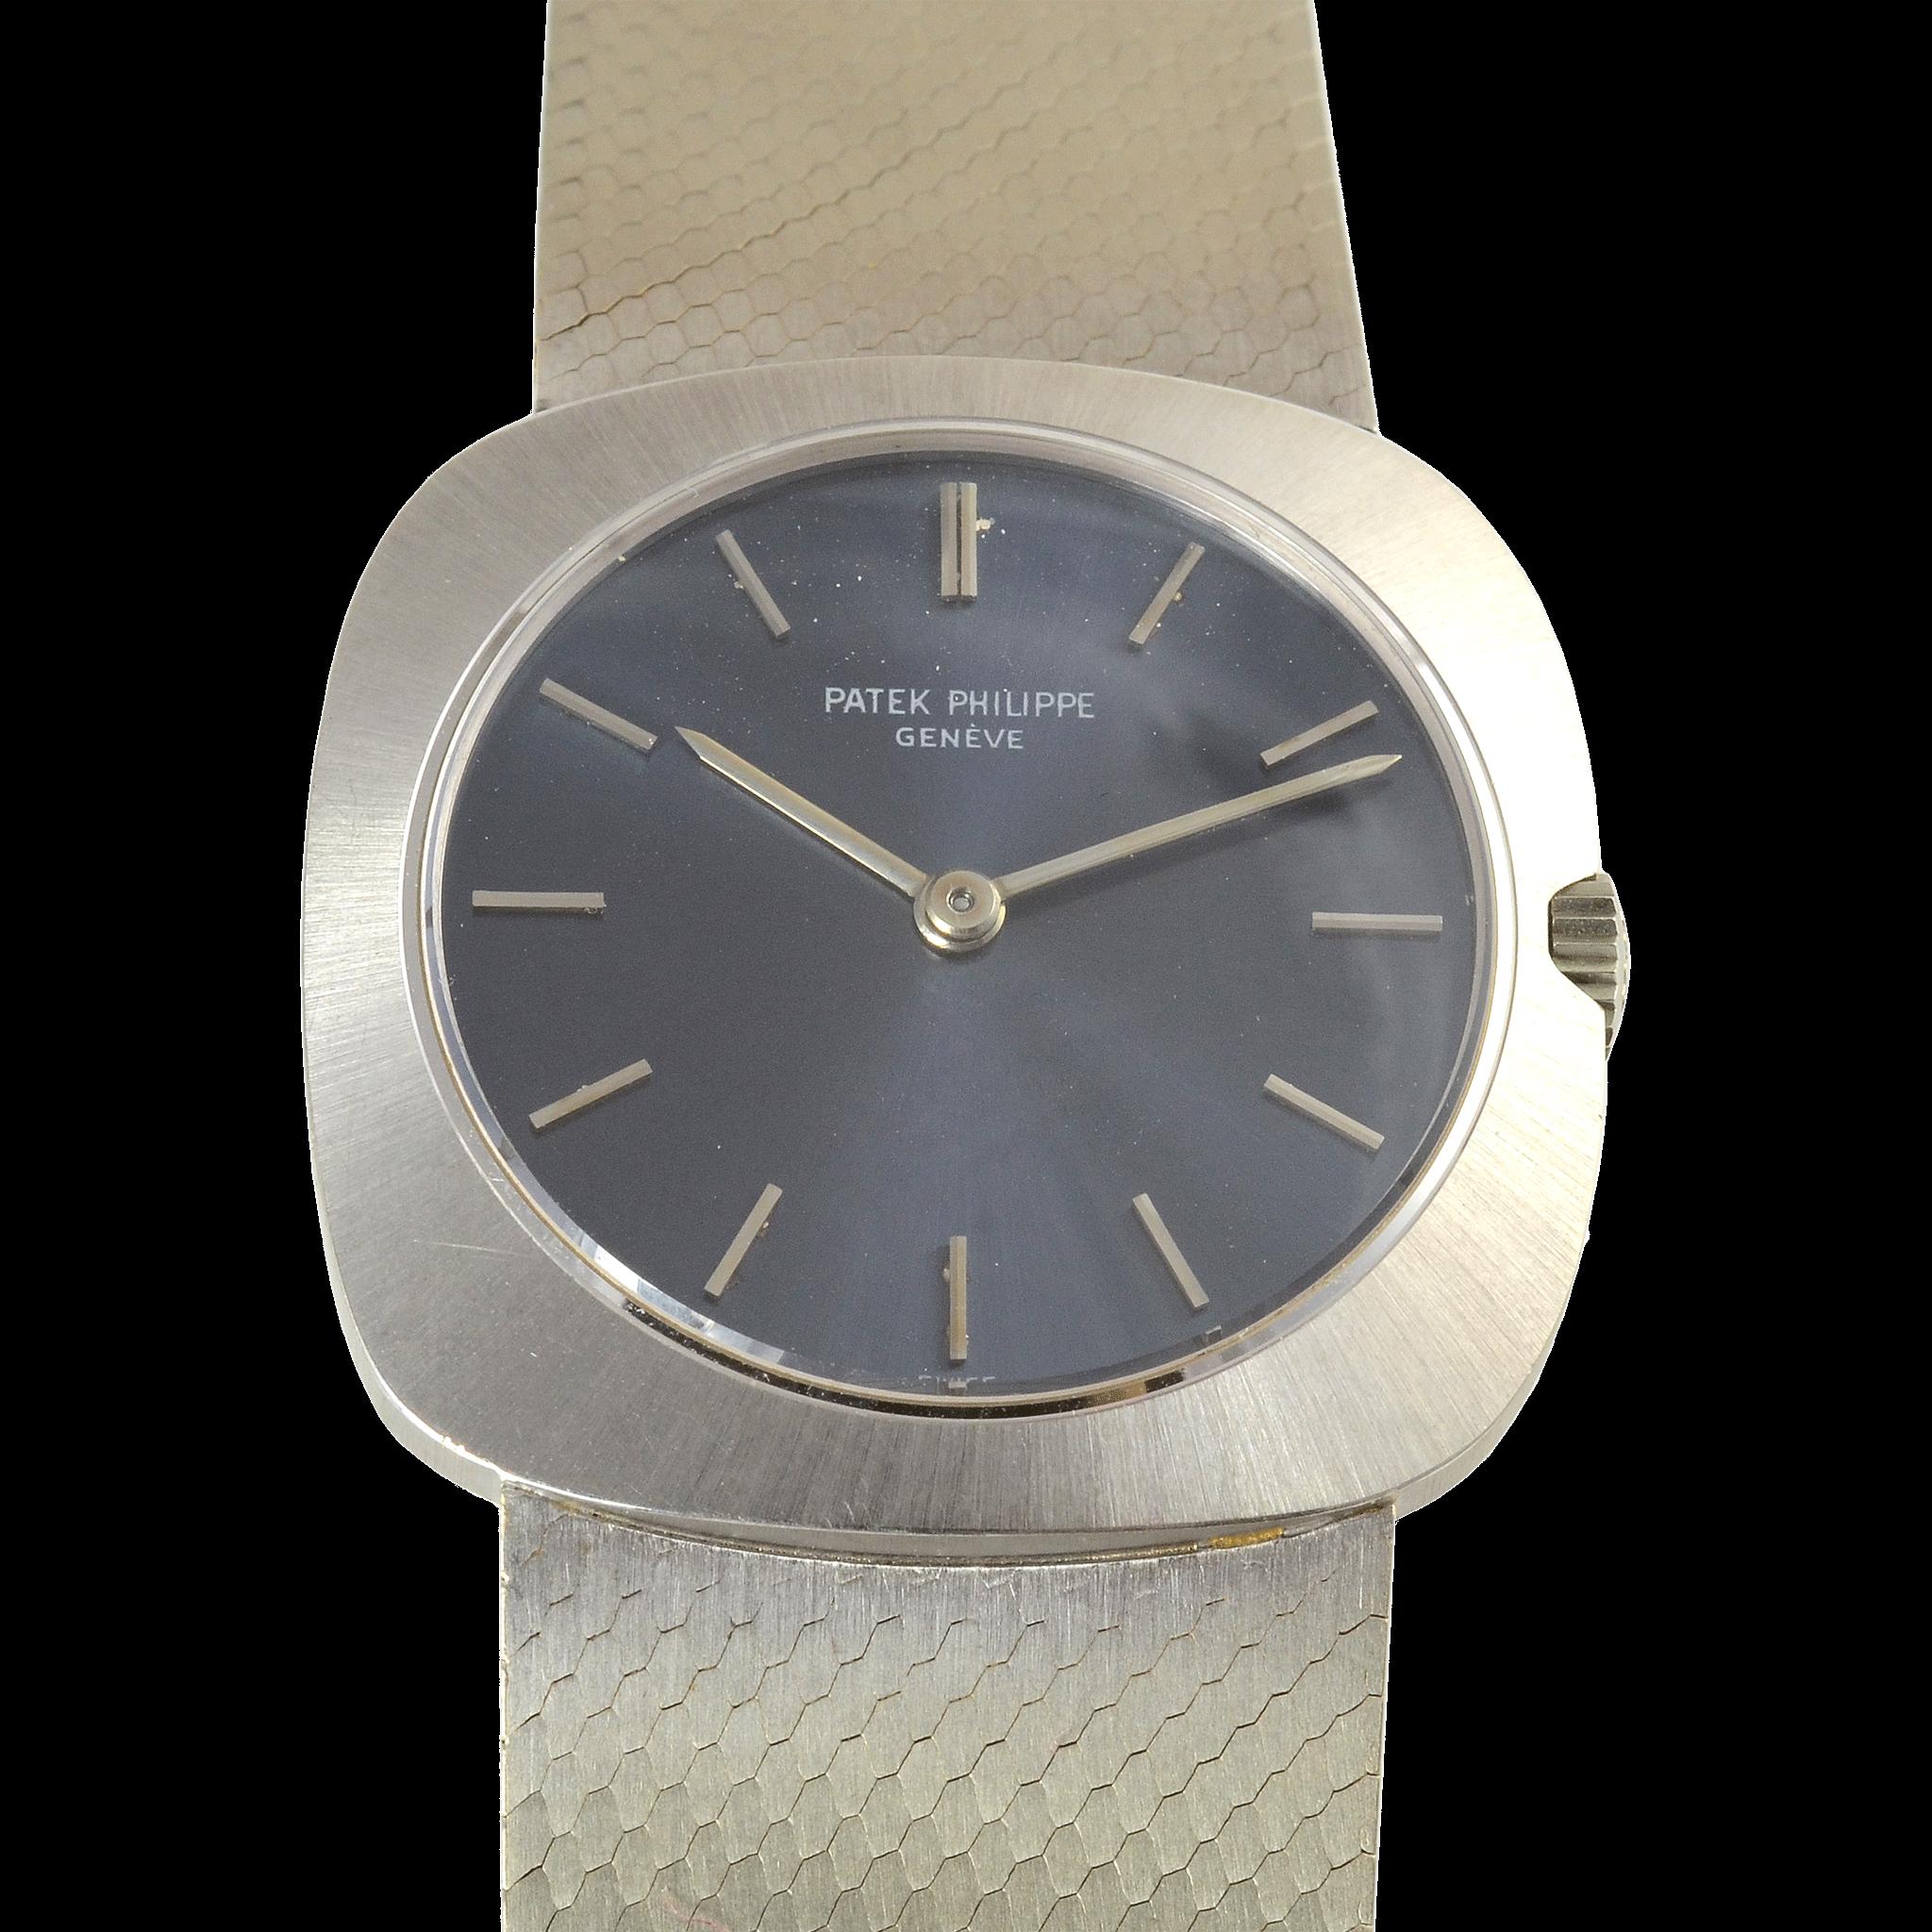 Swiss Mens 18K White Gold Wrist Watch by Patek Philippe